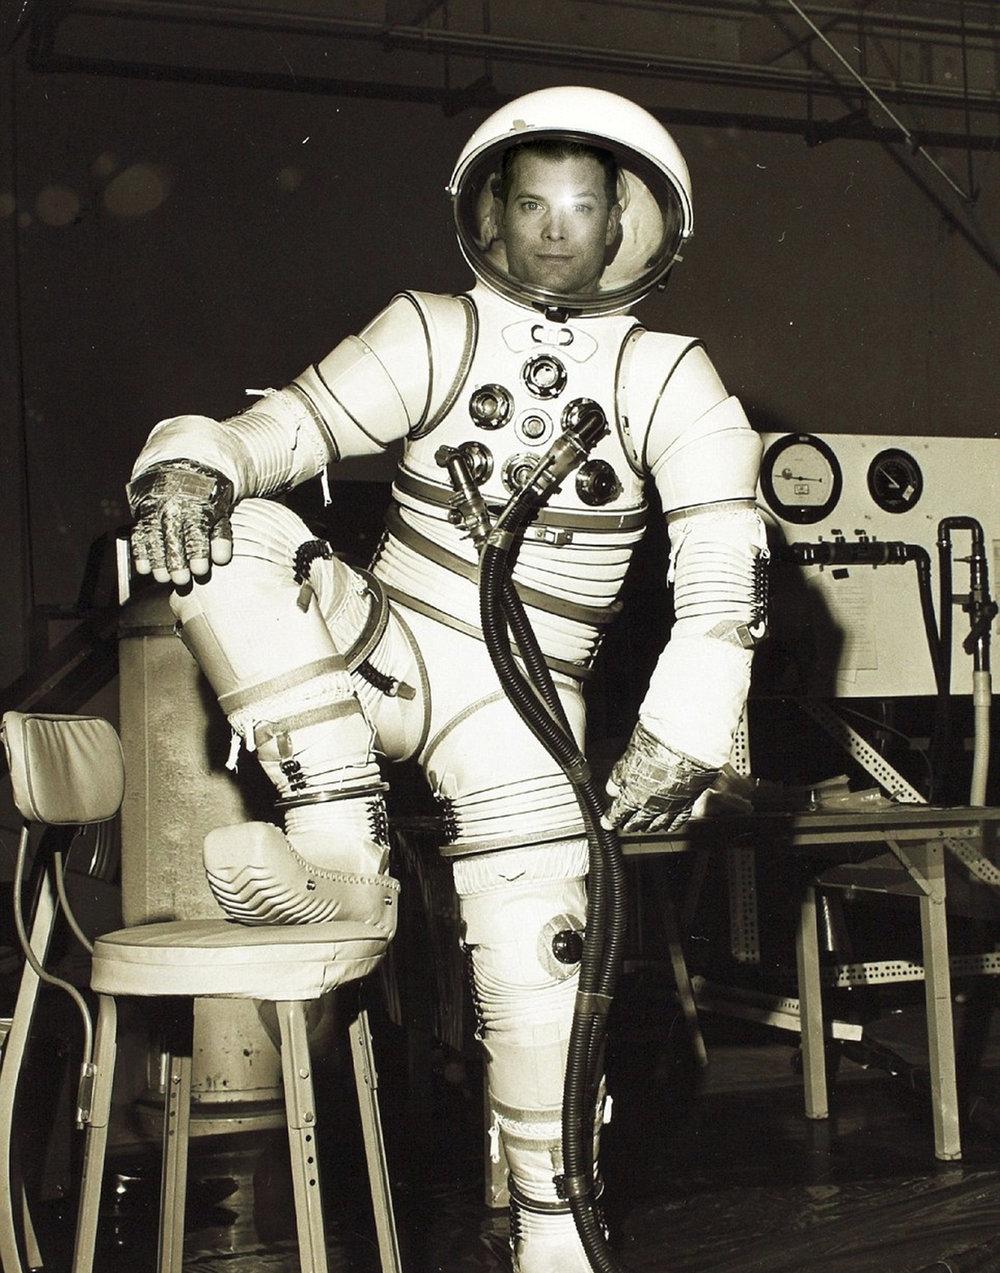 astronauts_47.jpg